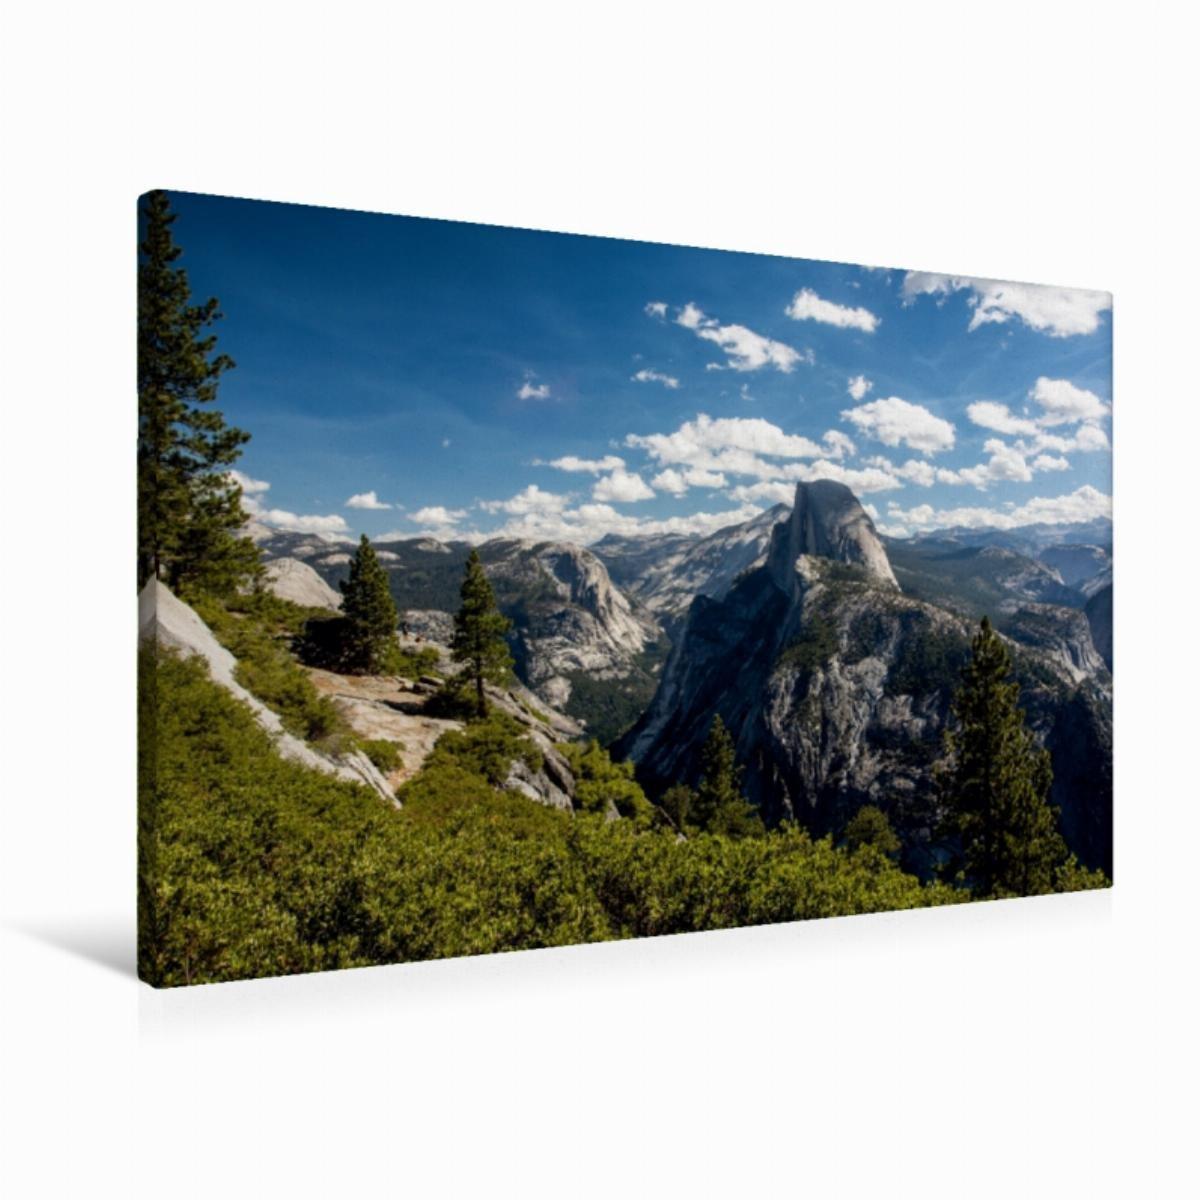 Premium Textil-Leinwand 90 cm x 60 cm quer Half Dome - Yosemite